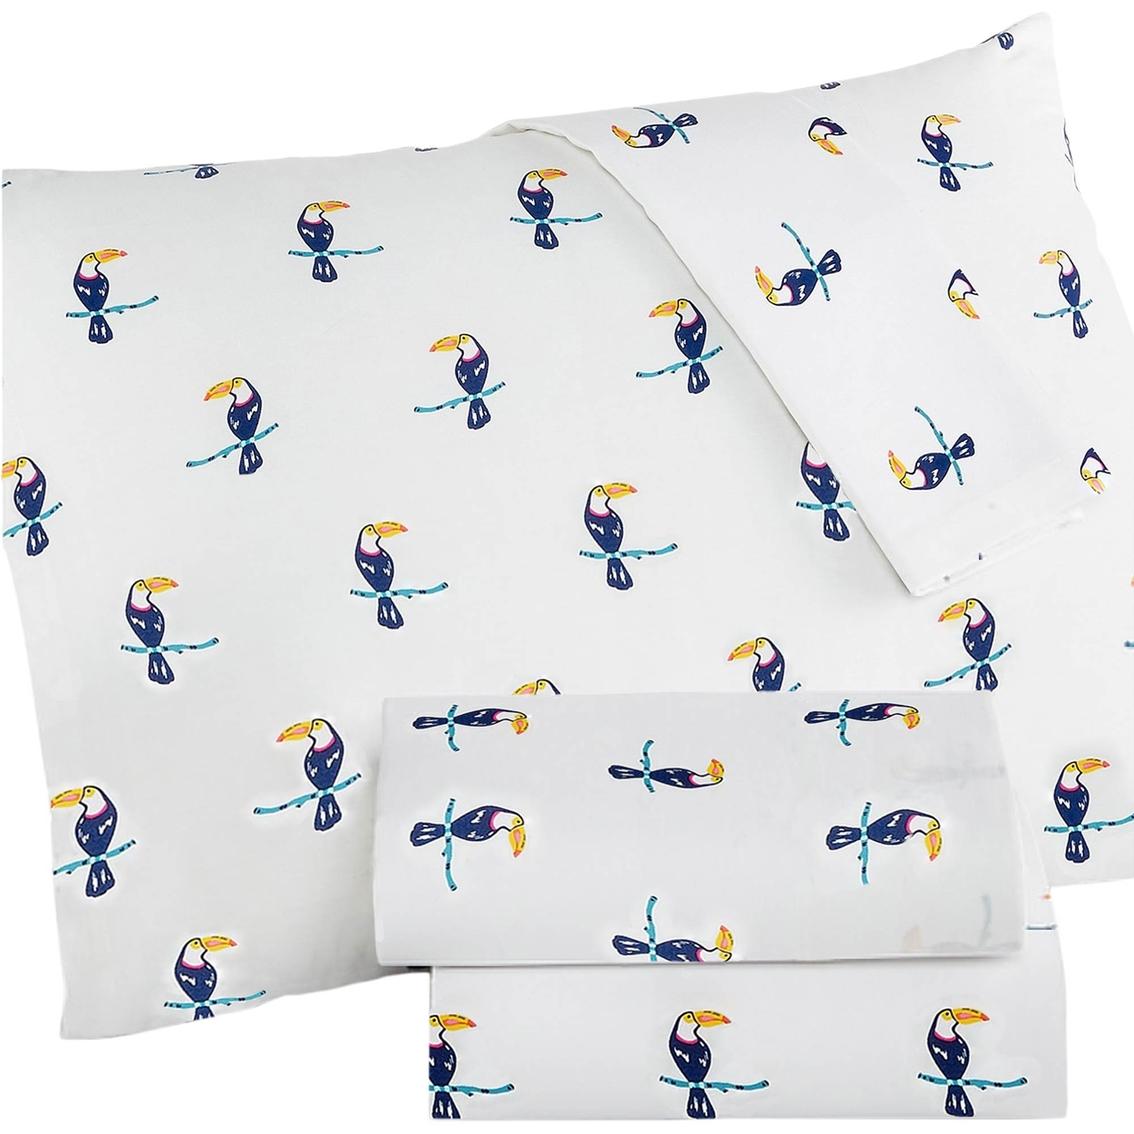 Martha Stewart Whim Collection Toucan Print 200 Thread Count Percale